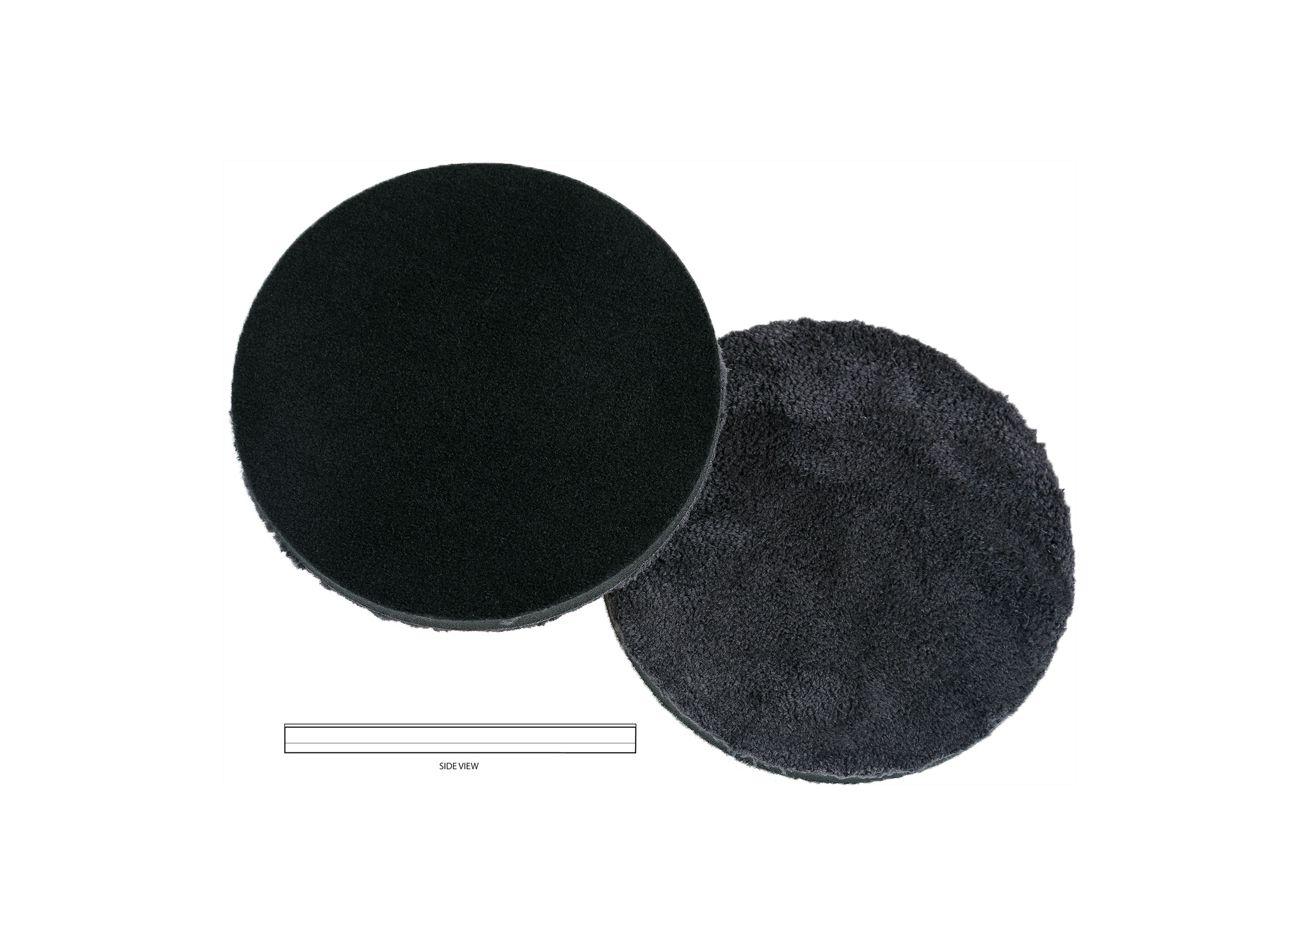 Boina de Microfibra Preta 5 pol LAKE COUNTRY